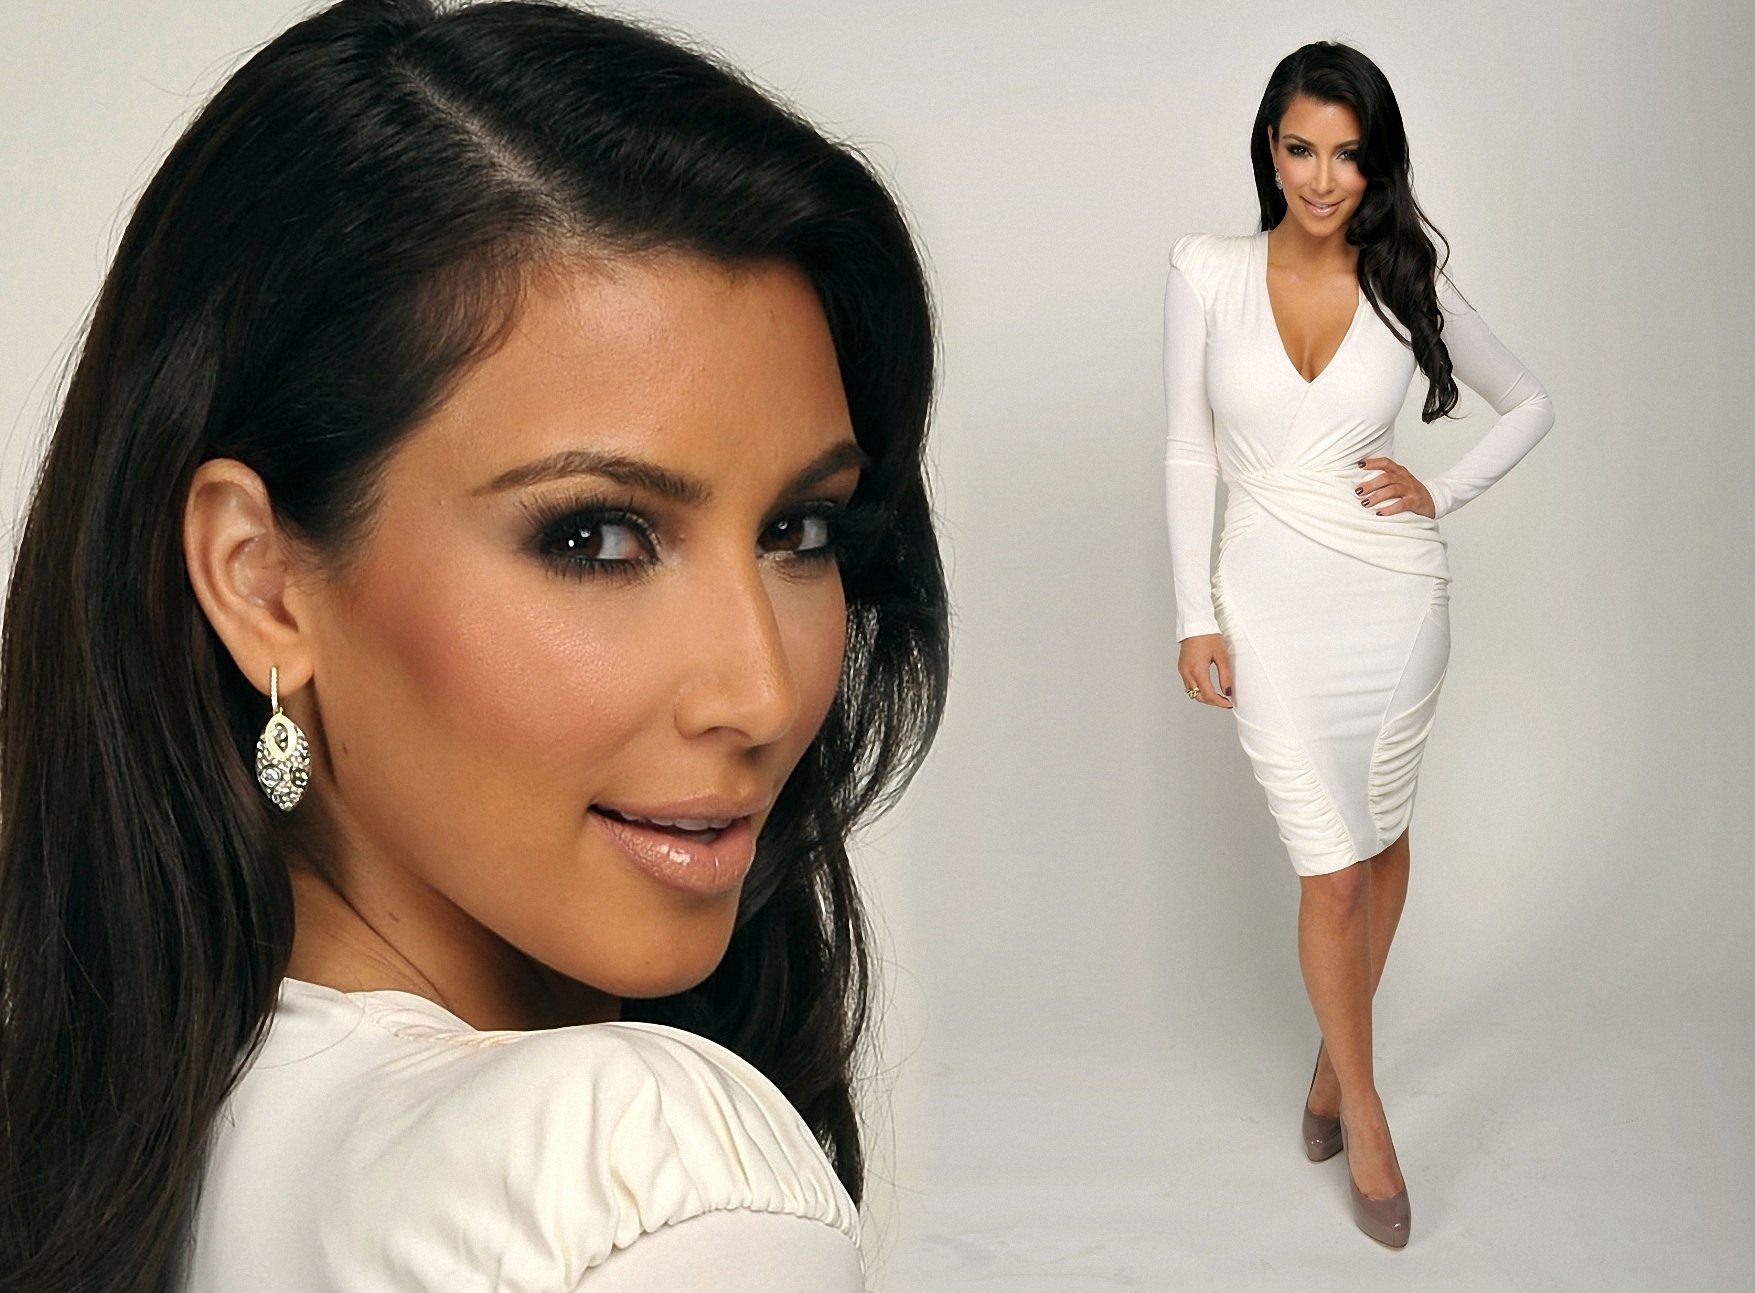 Kim Kardashian Wallpaper And Background Image 1755x1293